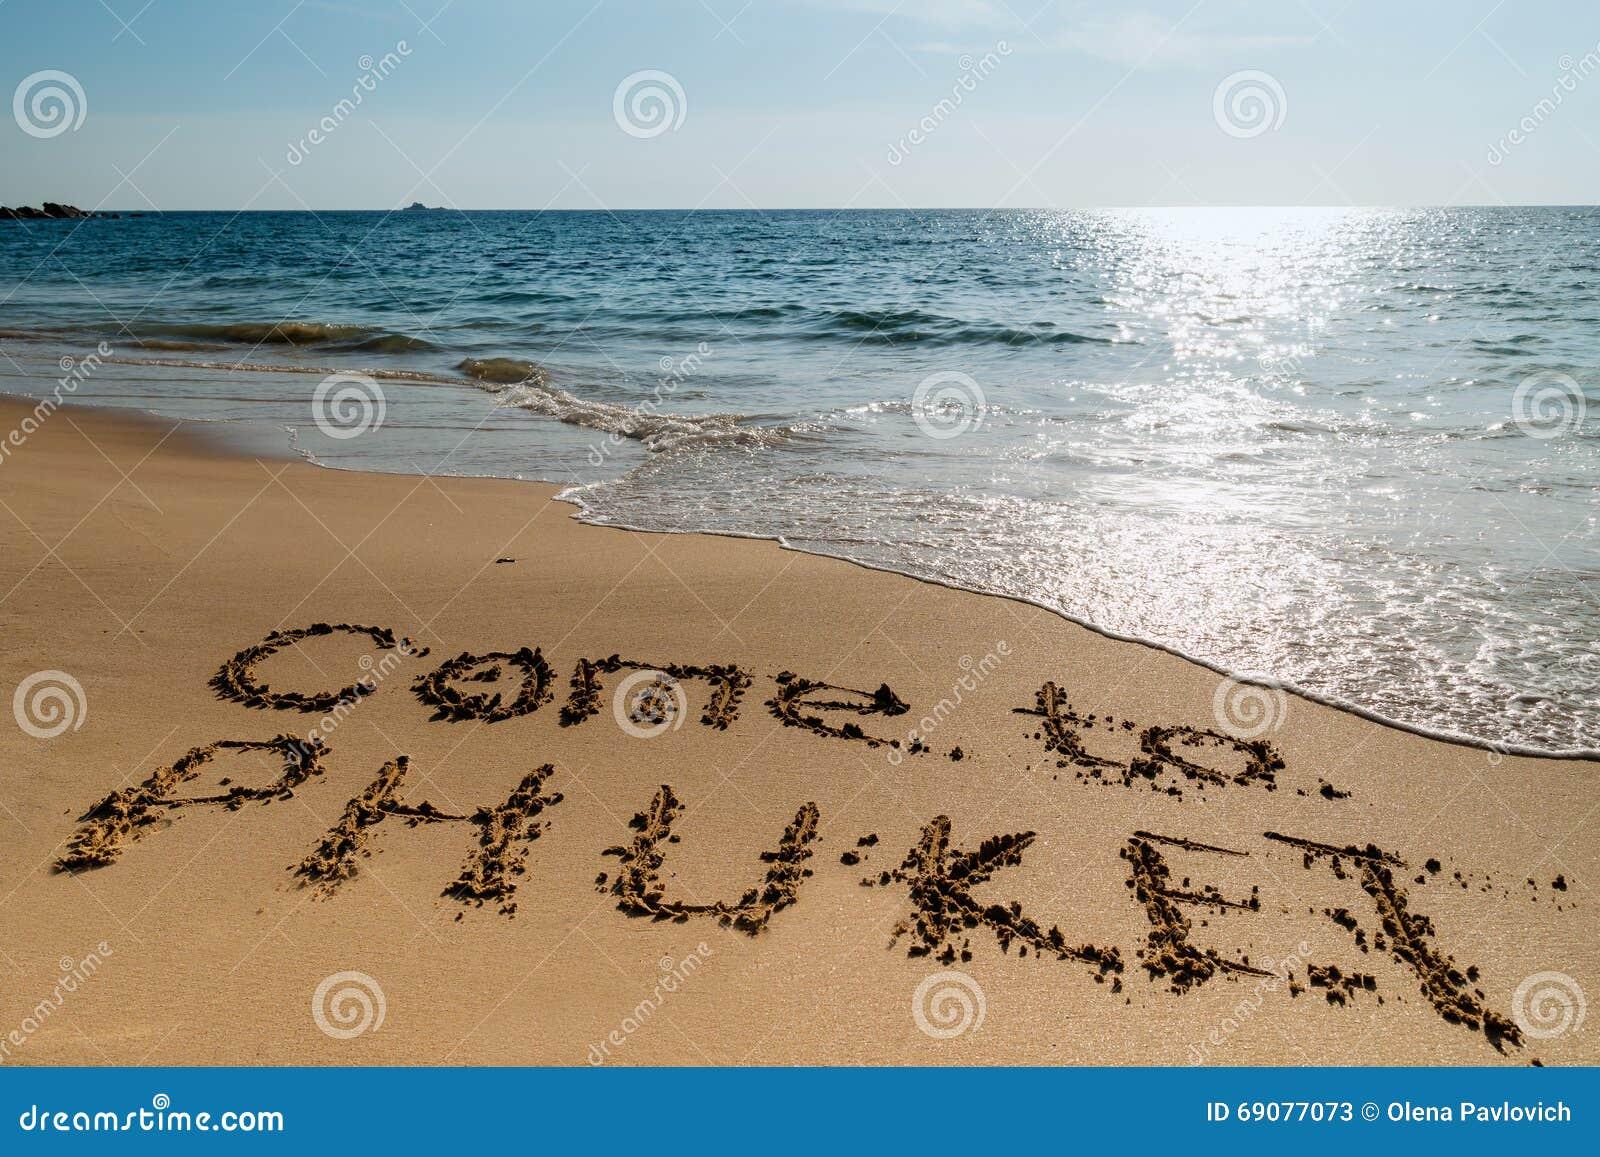 inscription on the sand Ñ Ð me to phuket stock image image of